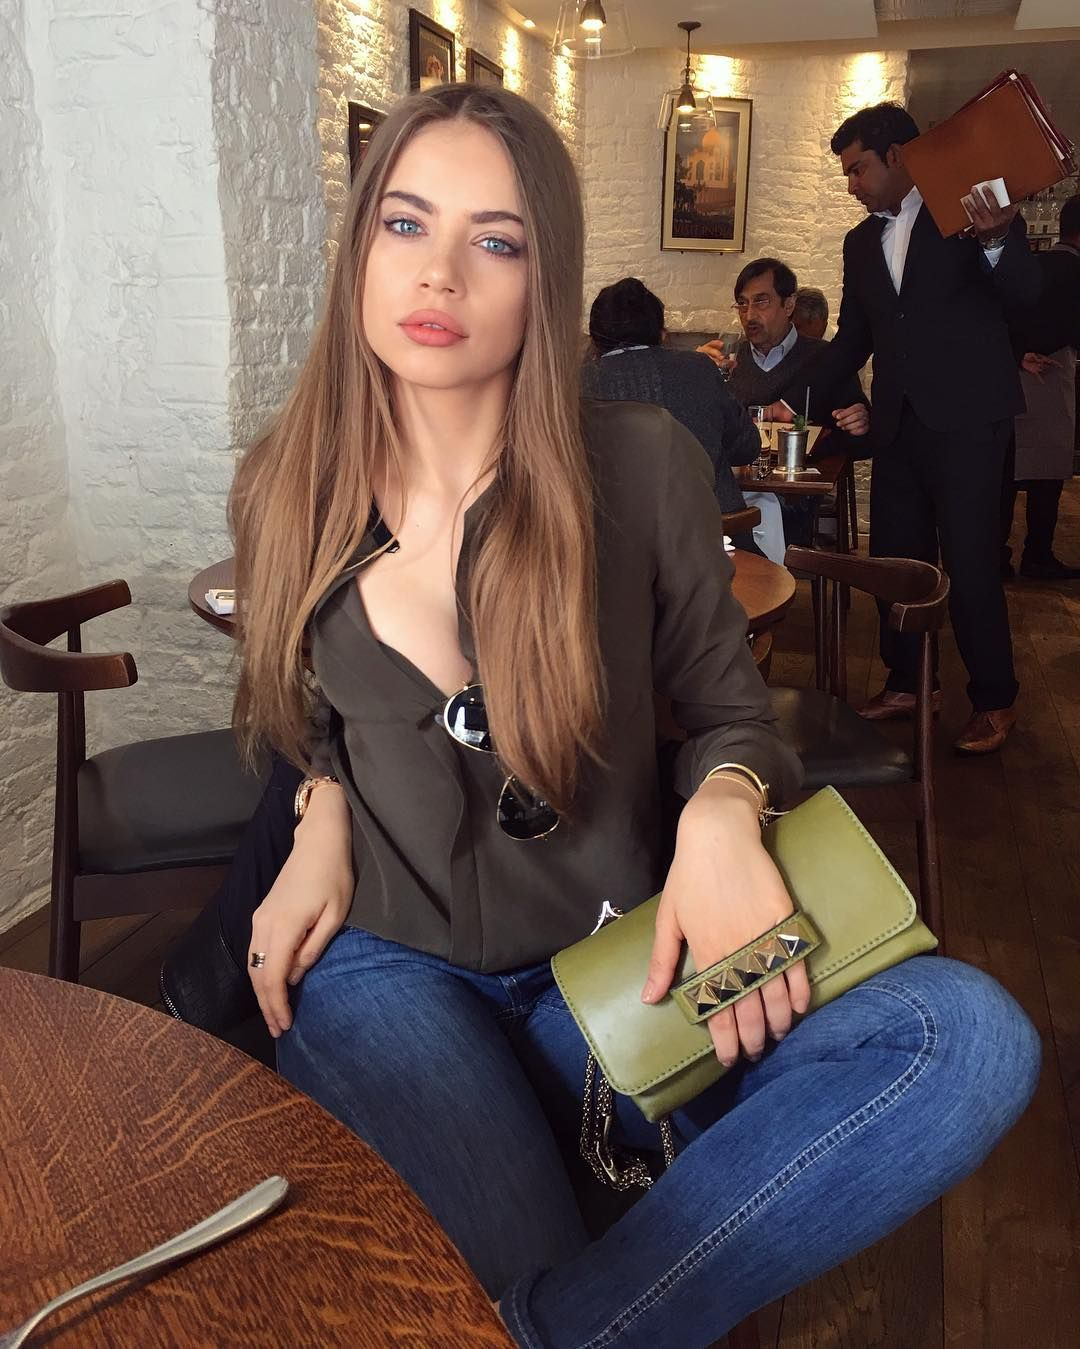 ICloud Xenia Tchoumitcheva nudes (94 photo), Ass, Cleavage, Selfie, panties 2018